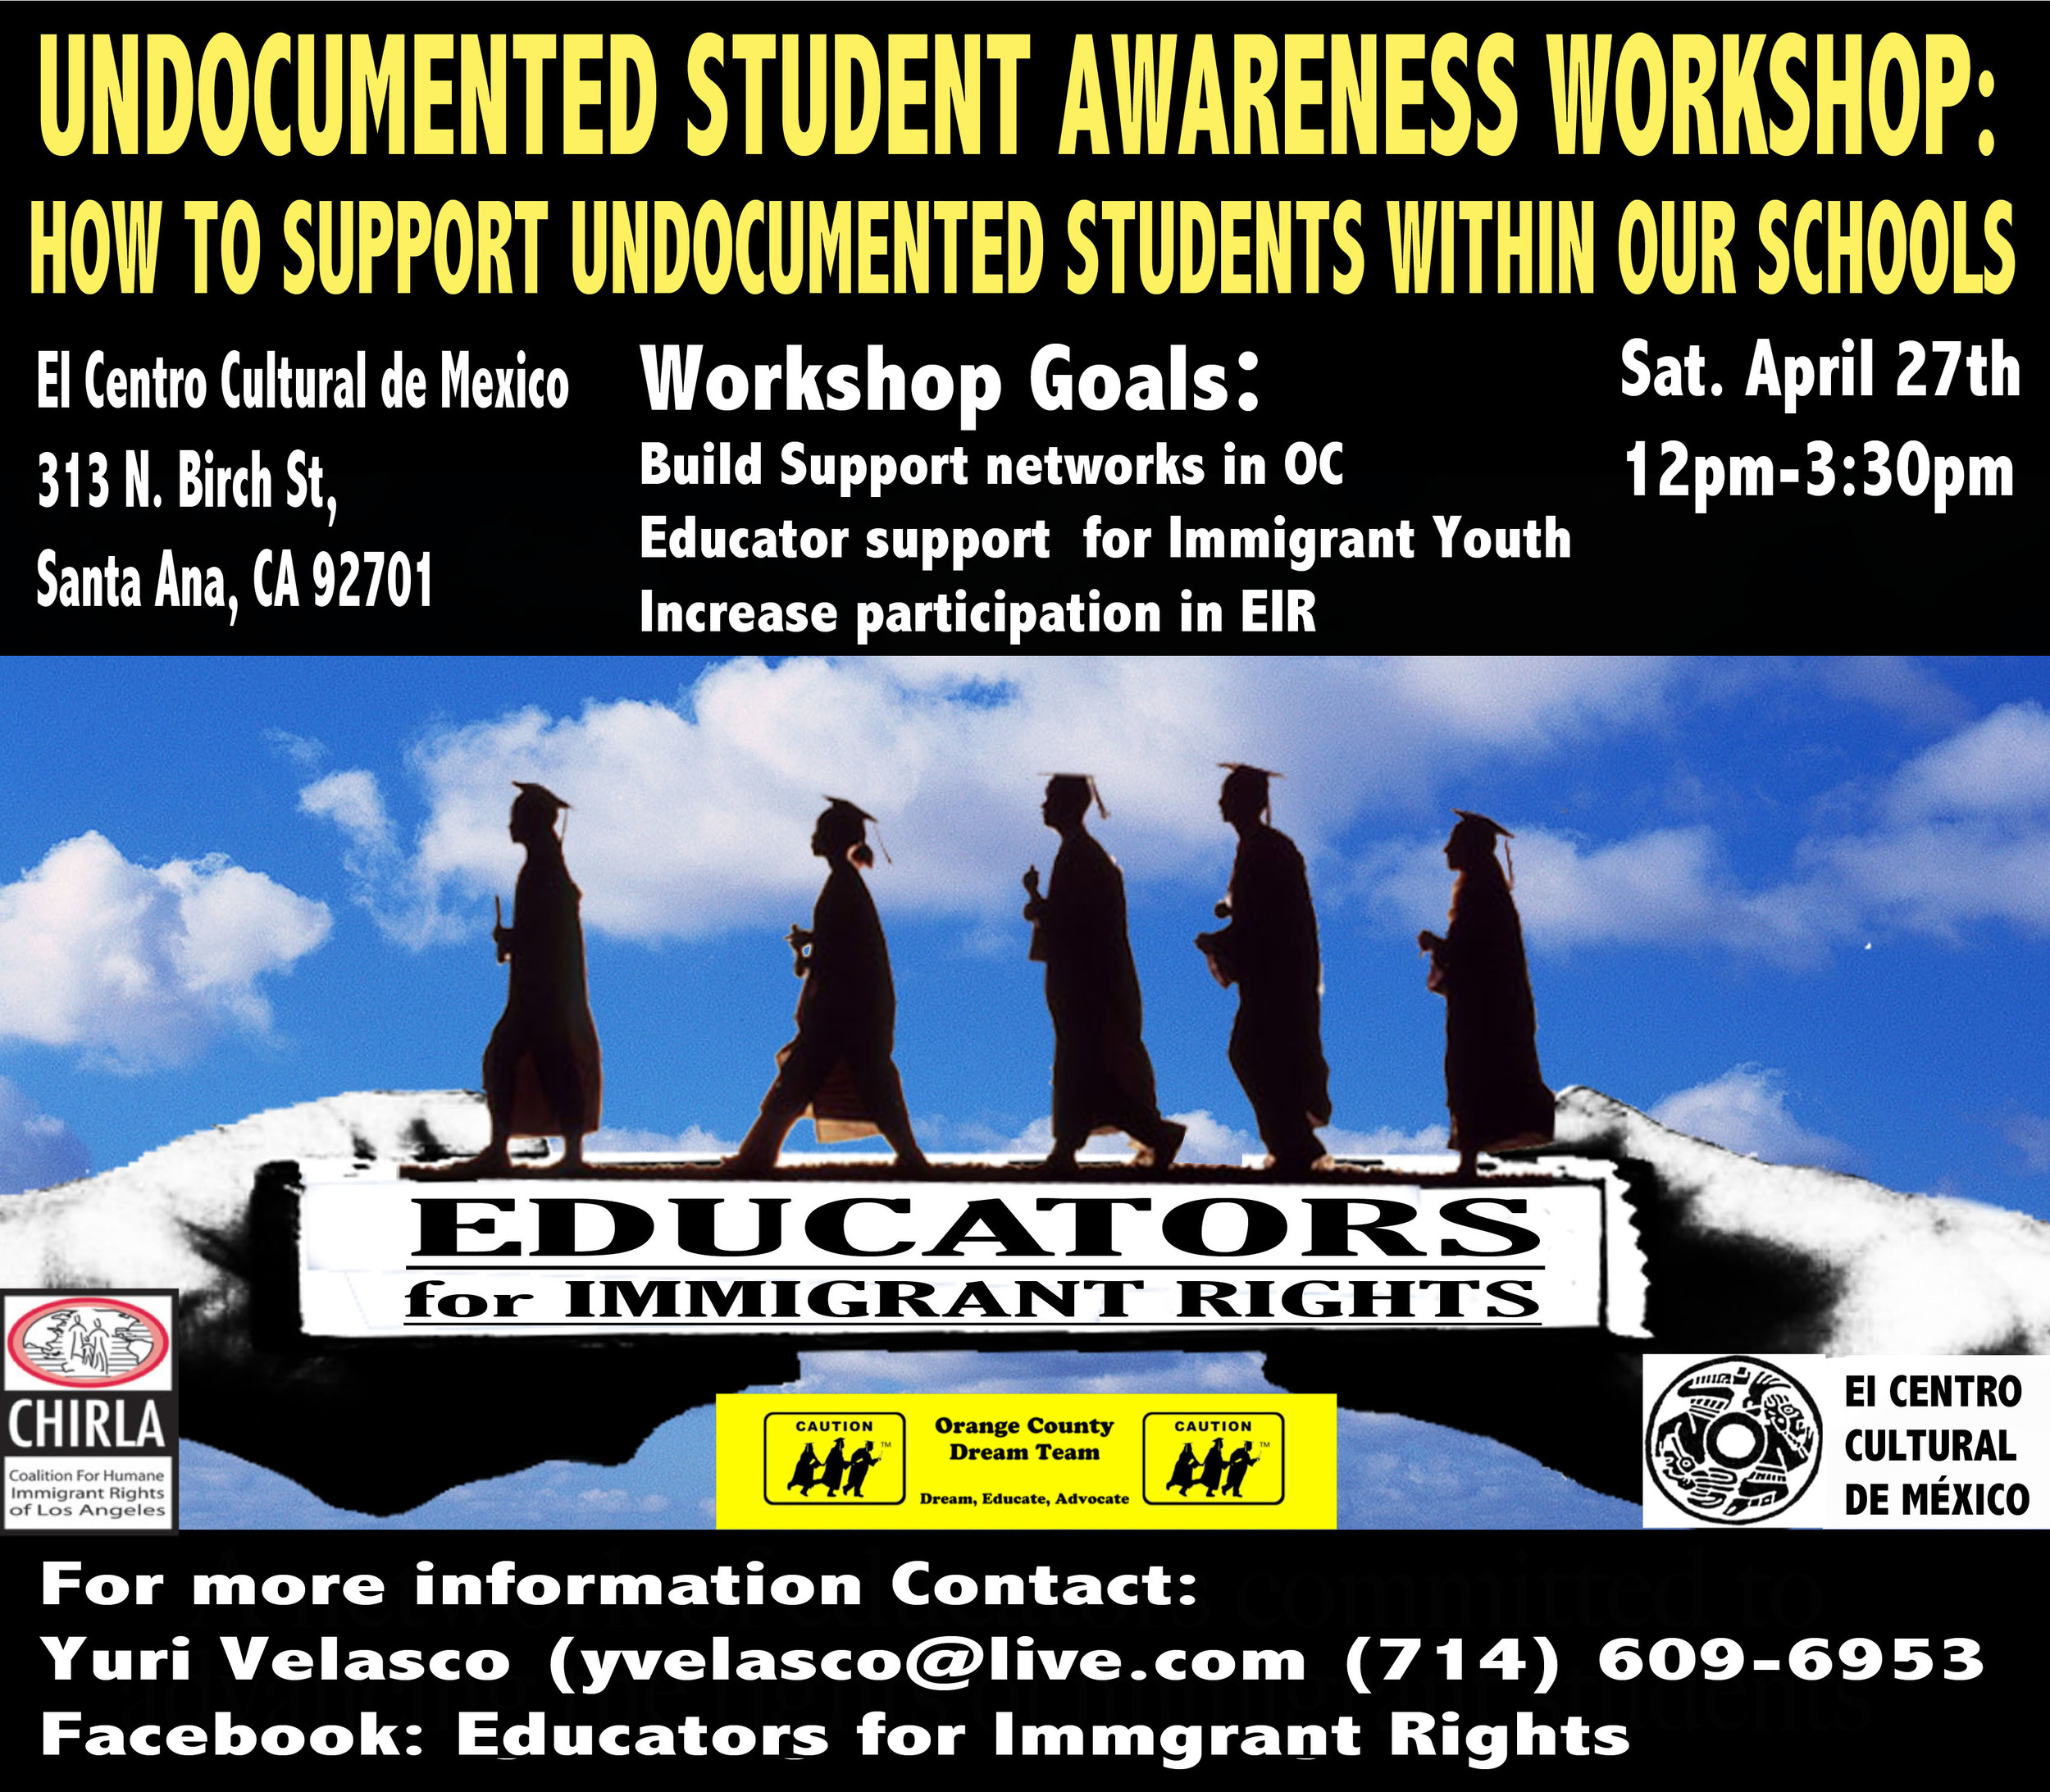 Undocumented Student Awareness Workshop